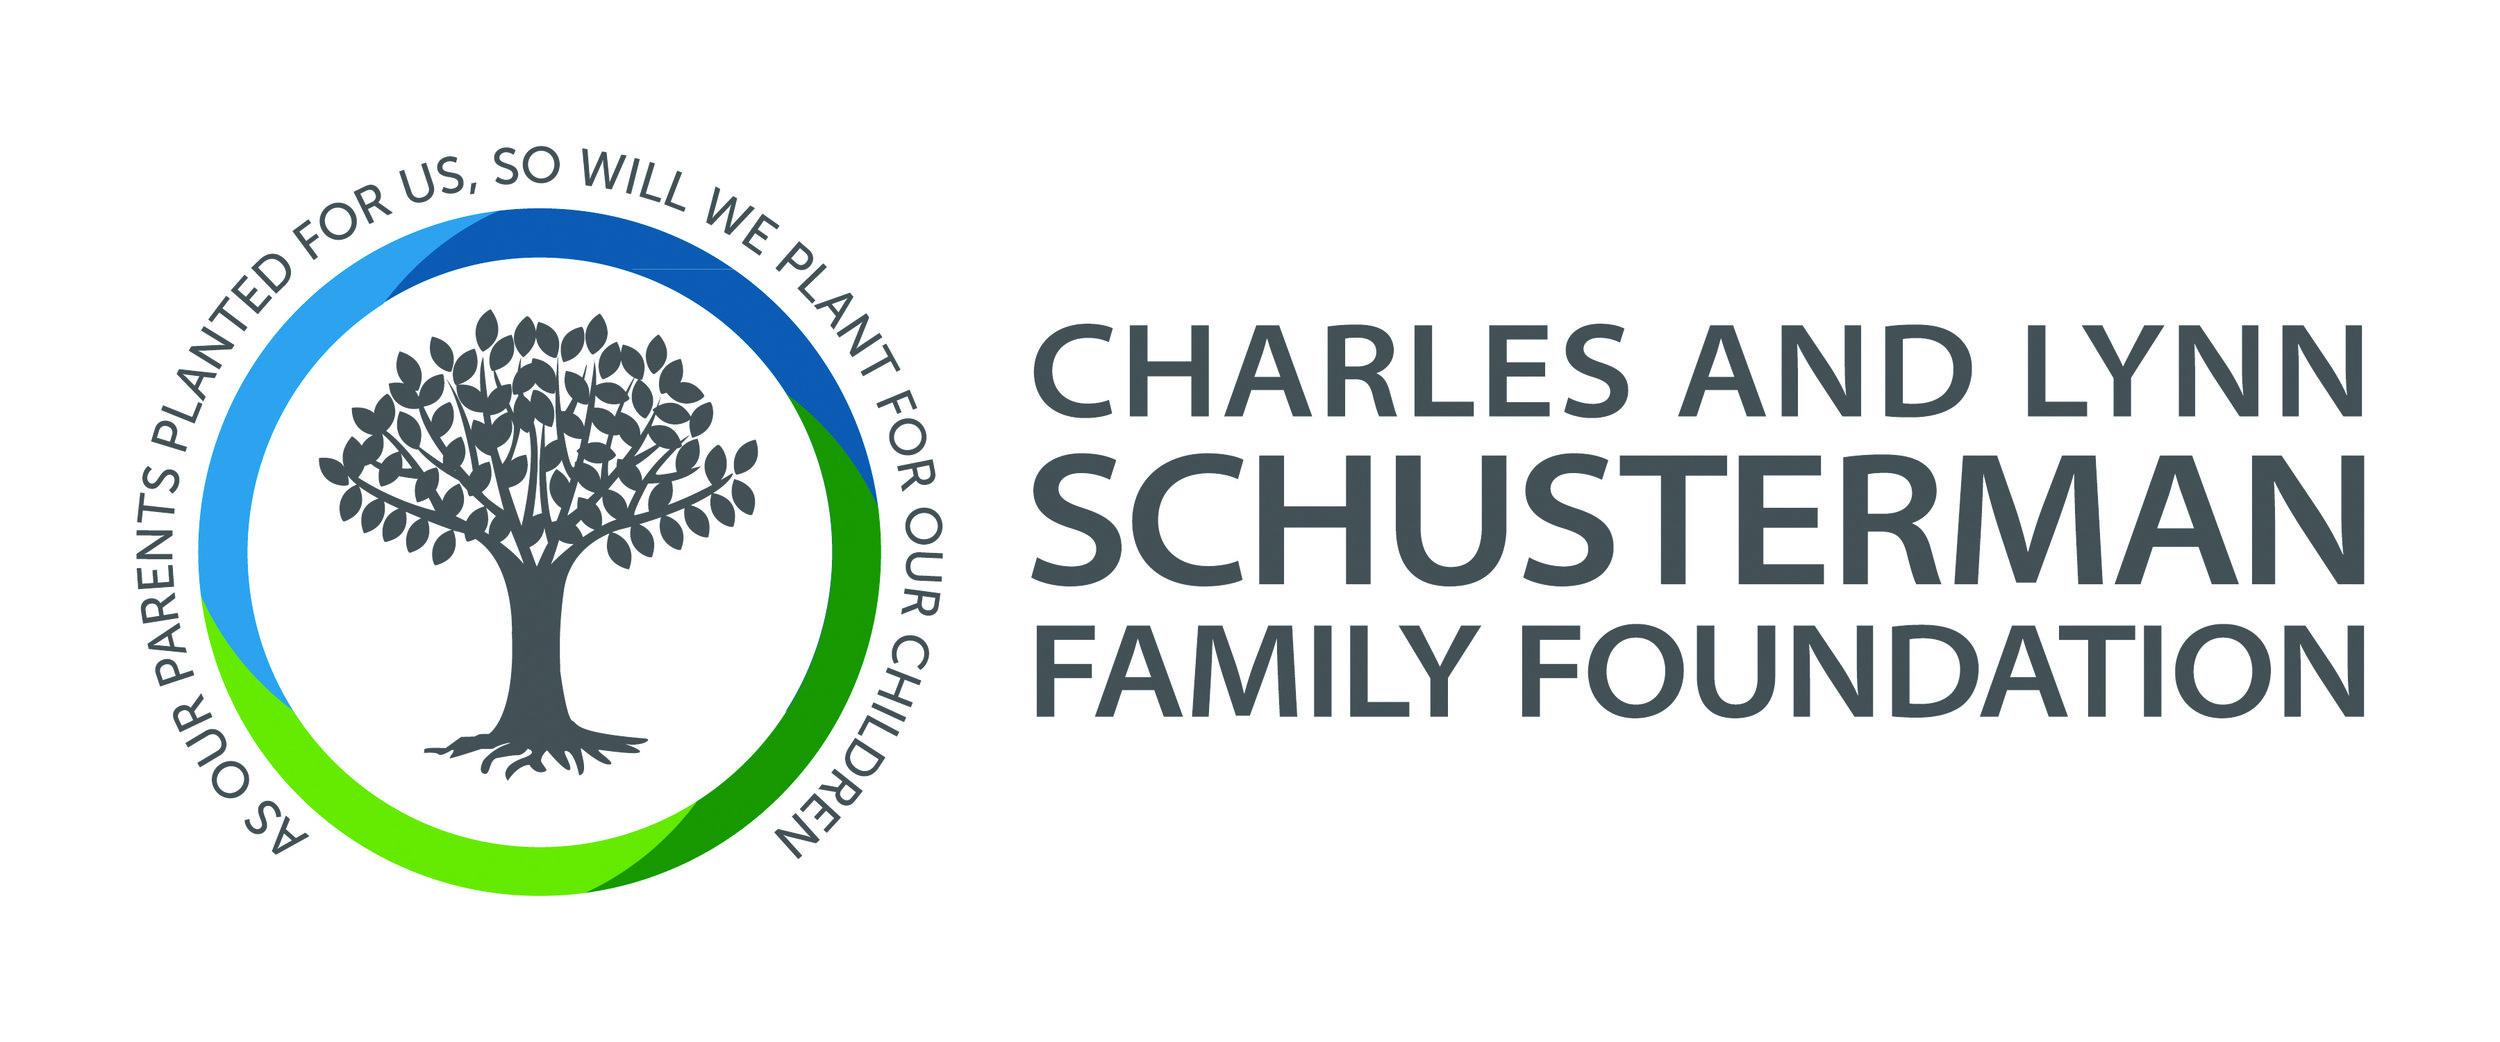 Schusterman-logo_official_h.jpg